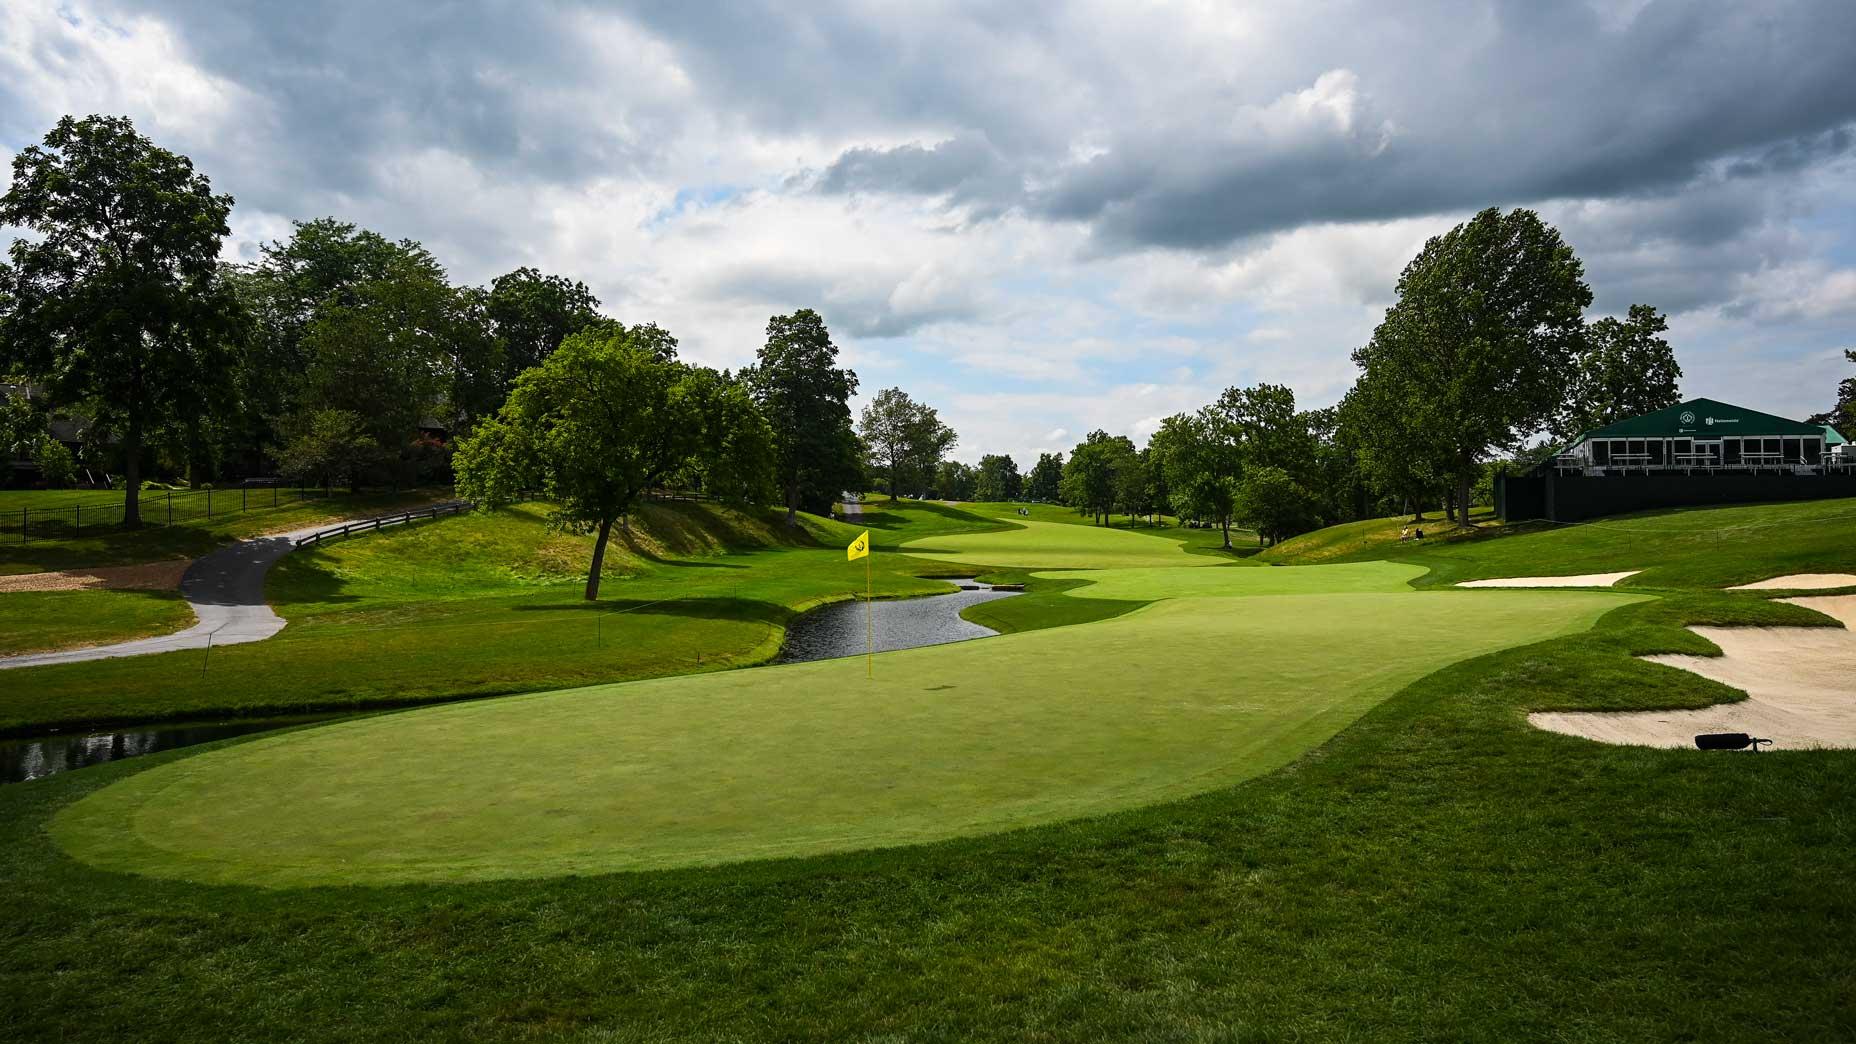 The par-4 14th hole at Muirfield Village Golf Club in 2020.